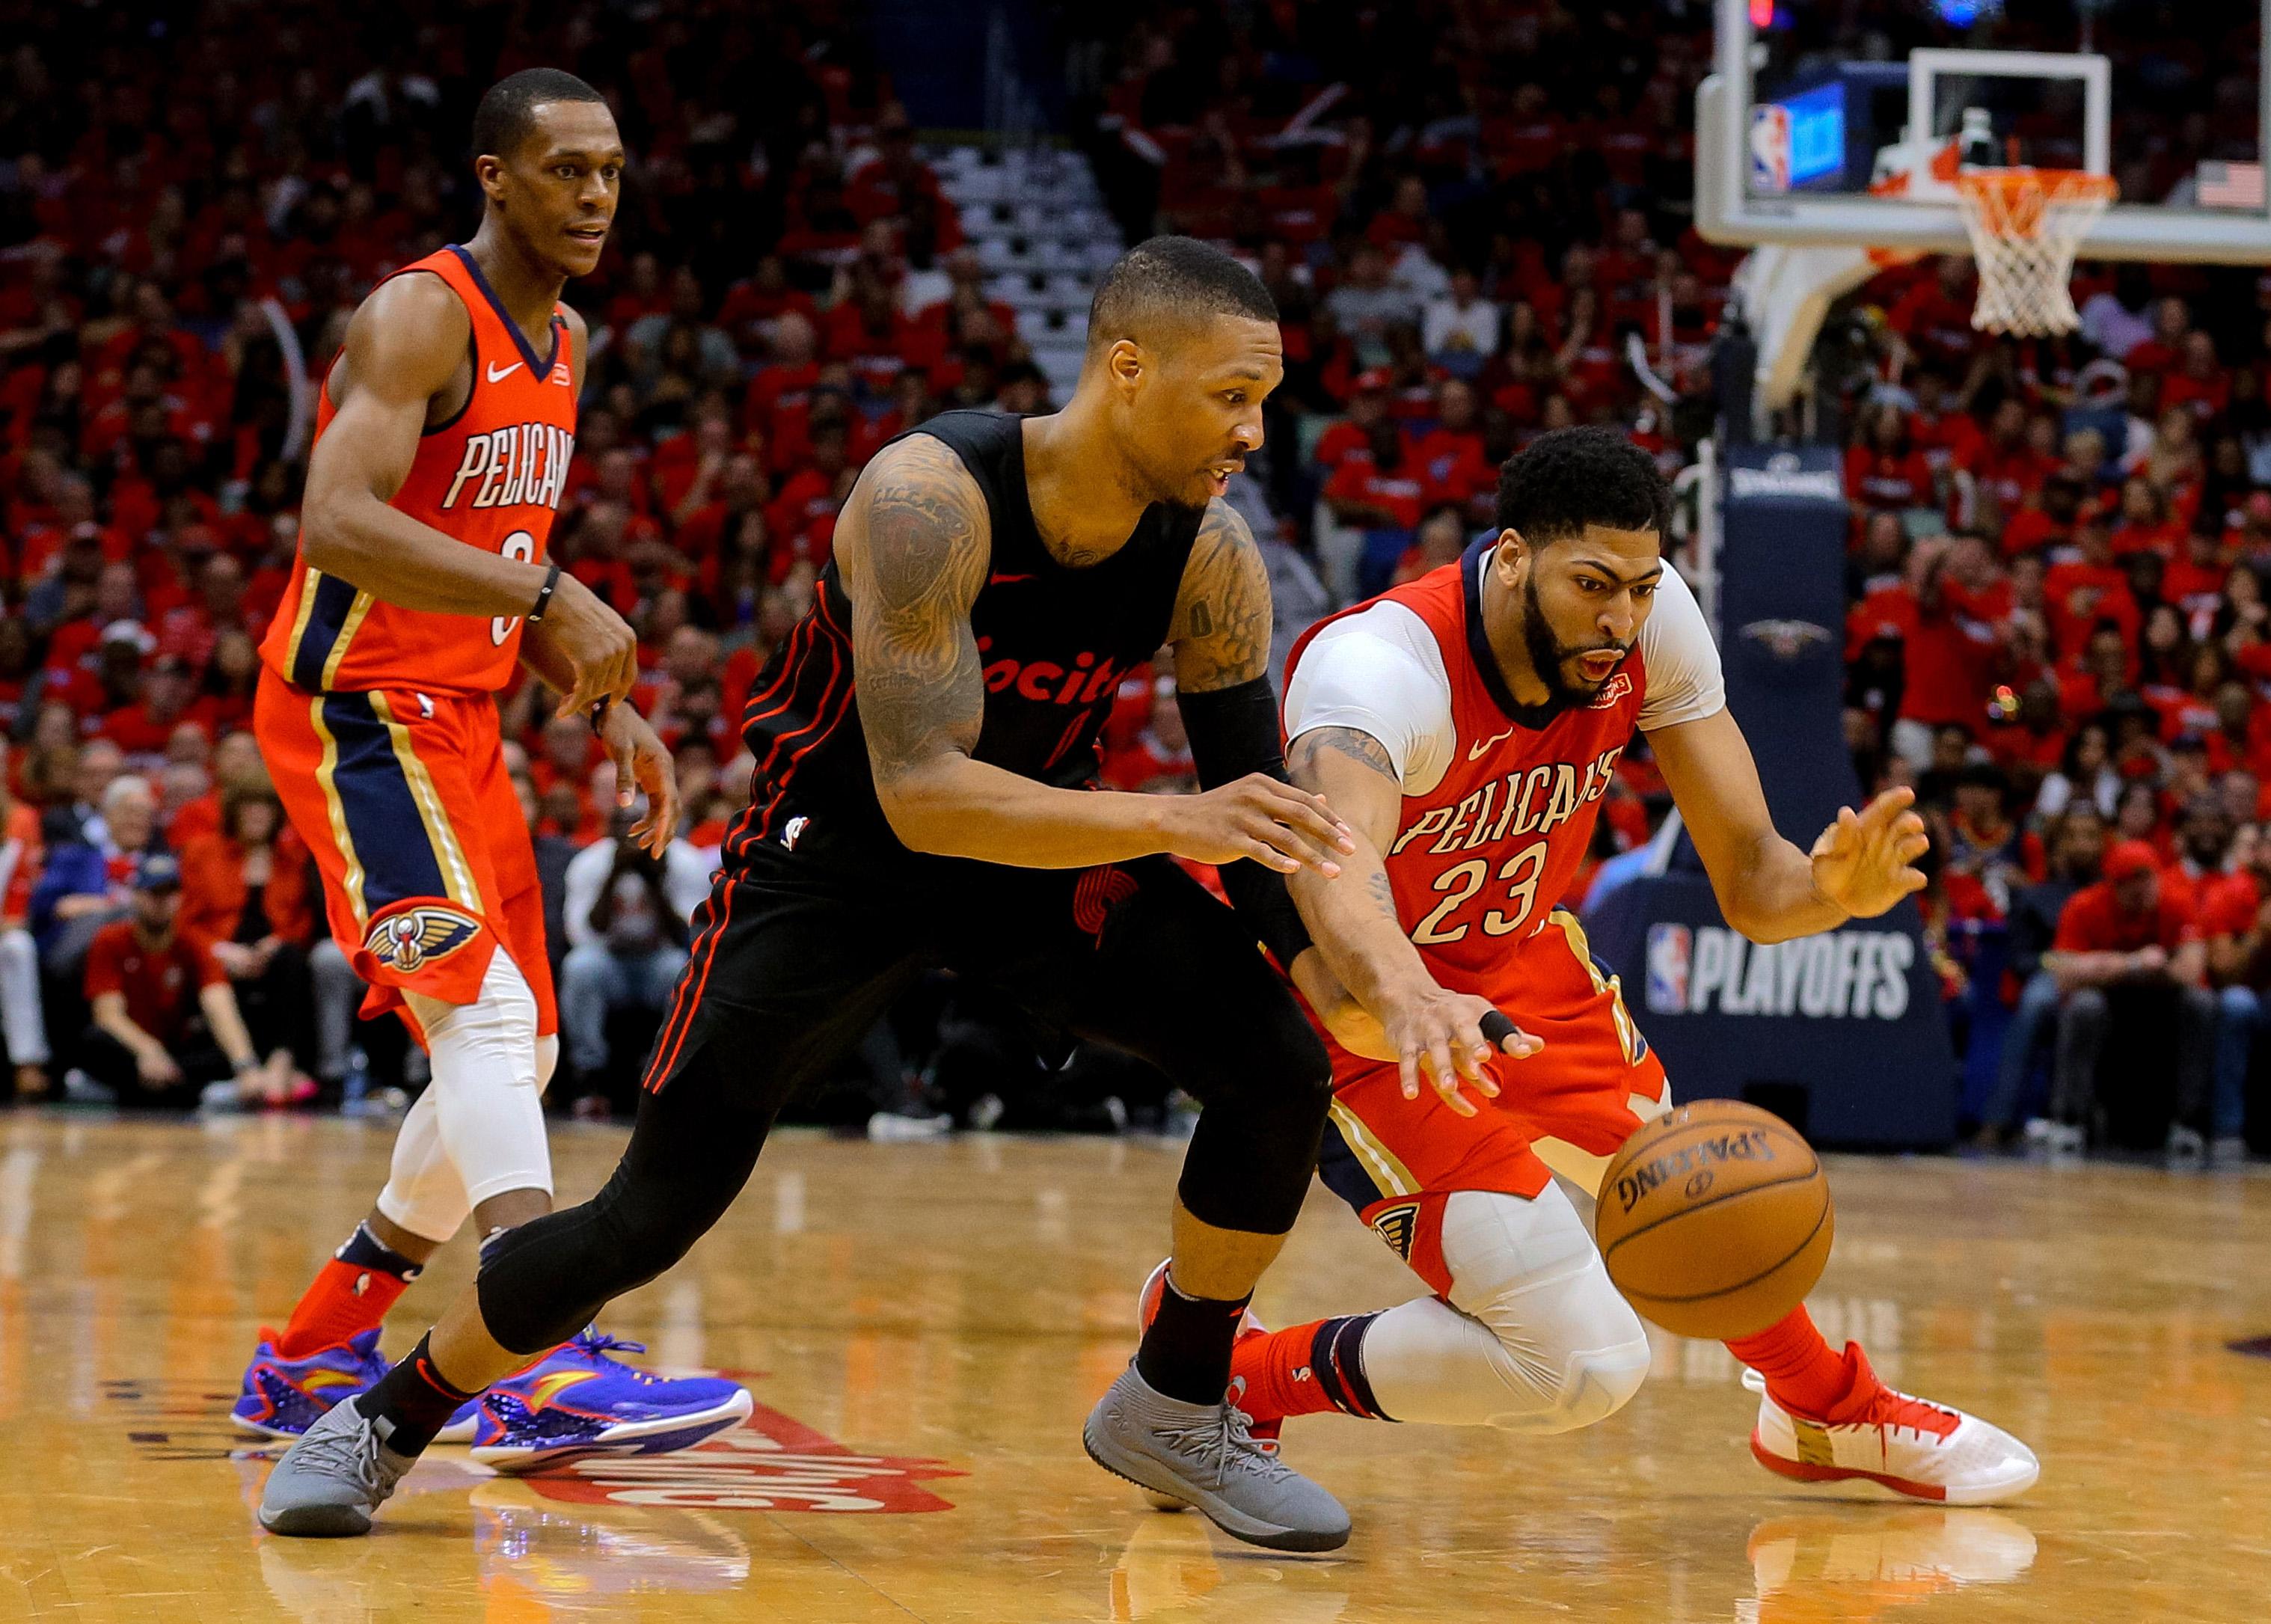 Pelican Post Game Report #180 Pelicans VS Trail Blazers Playoff Game 3 Recap & More...